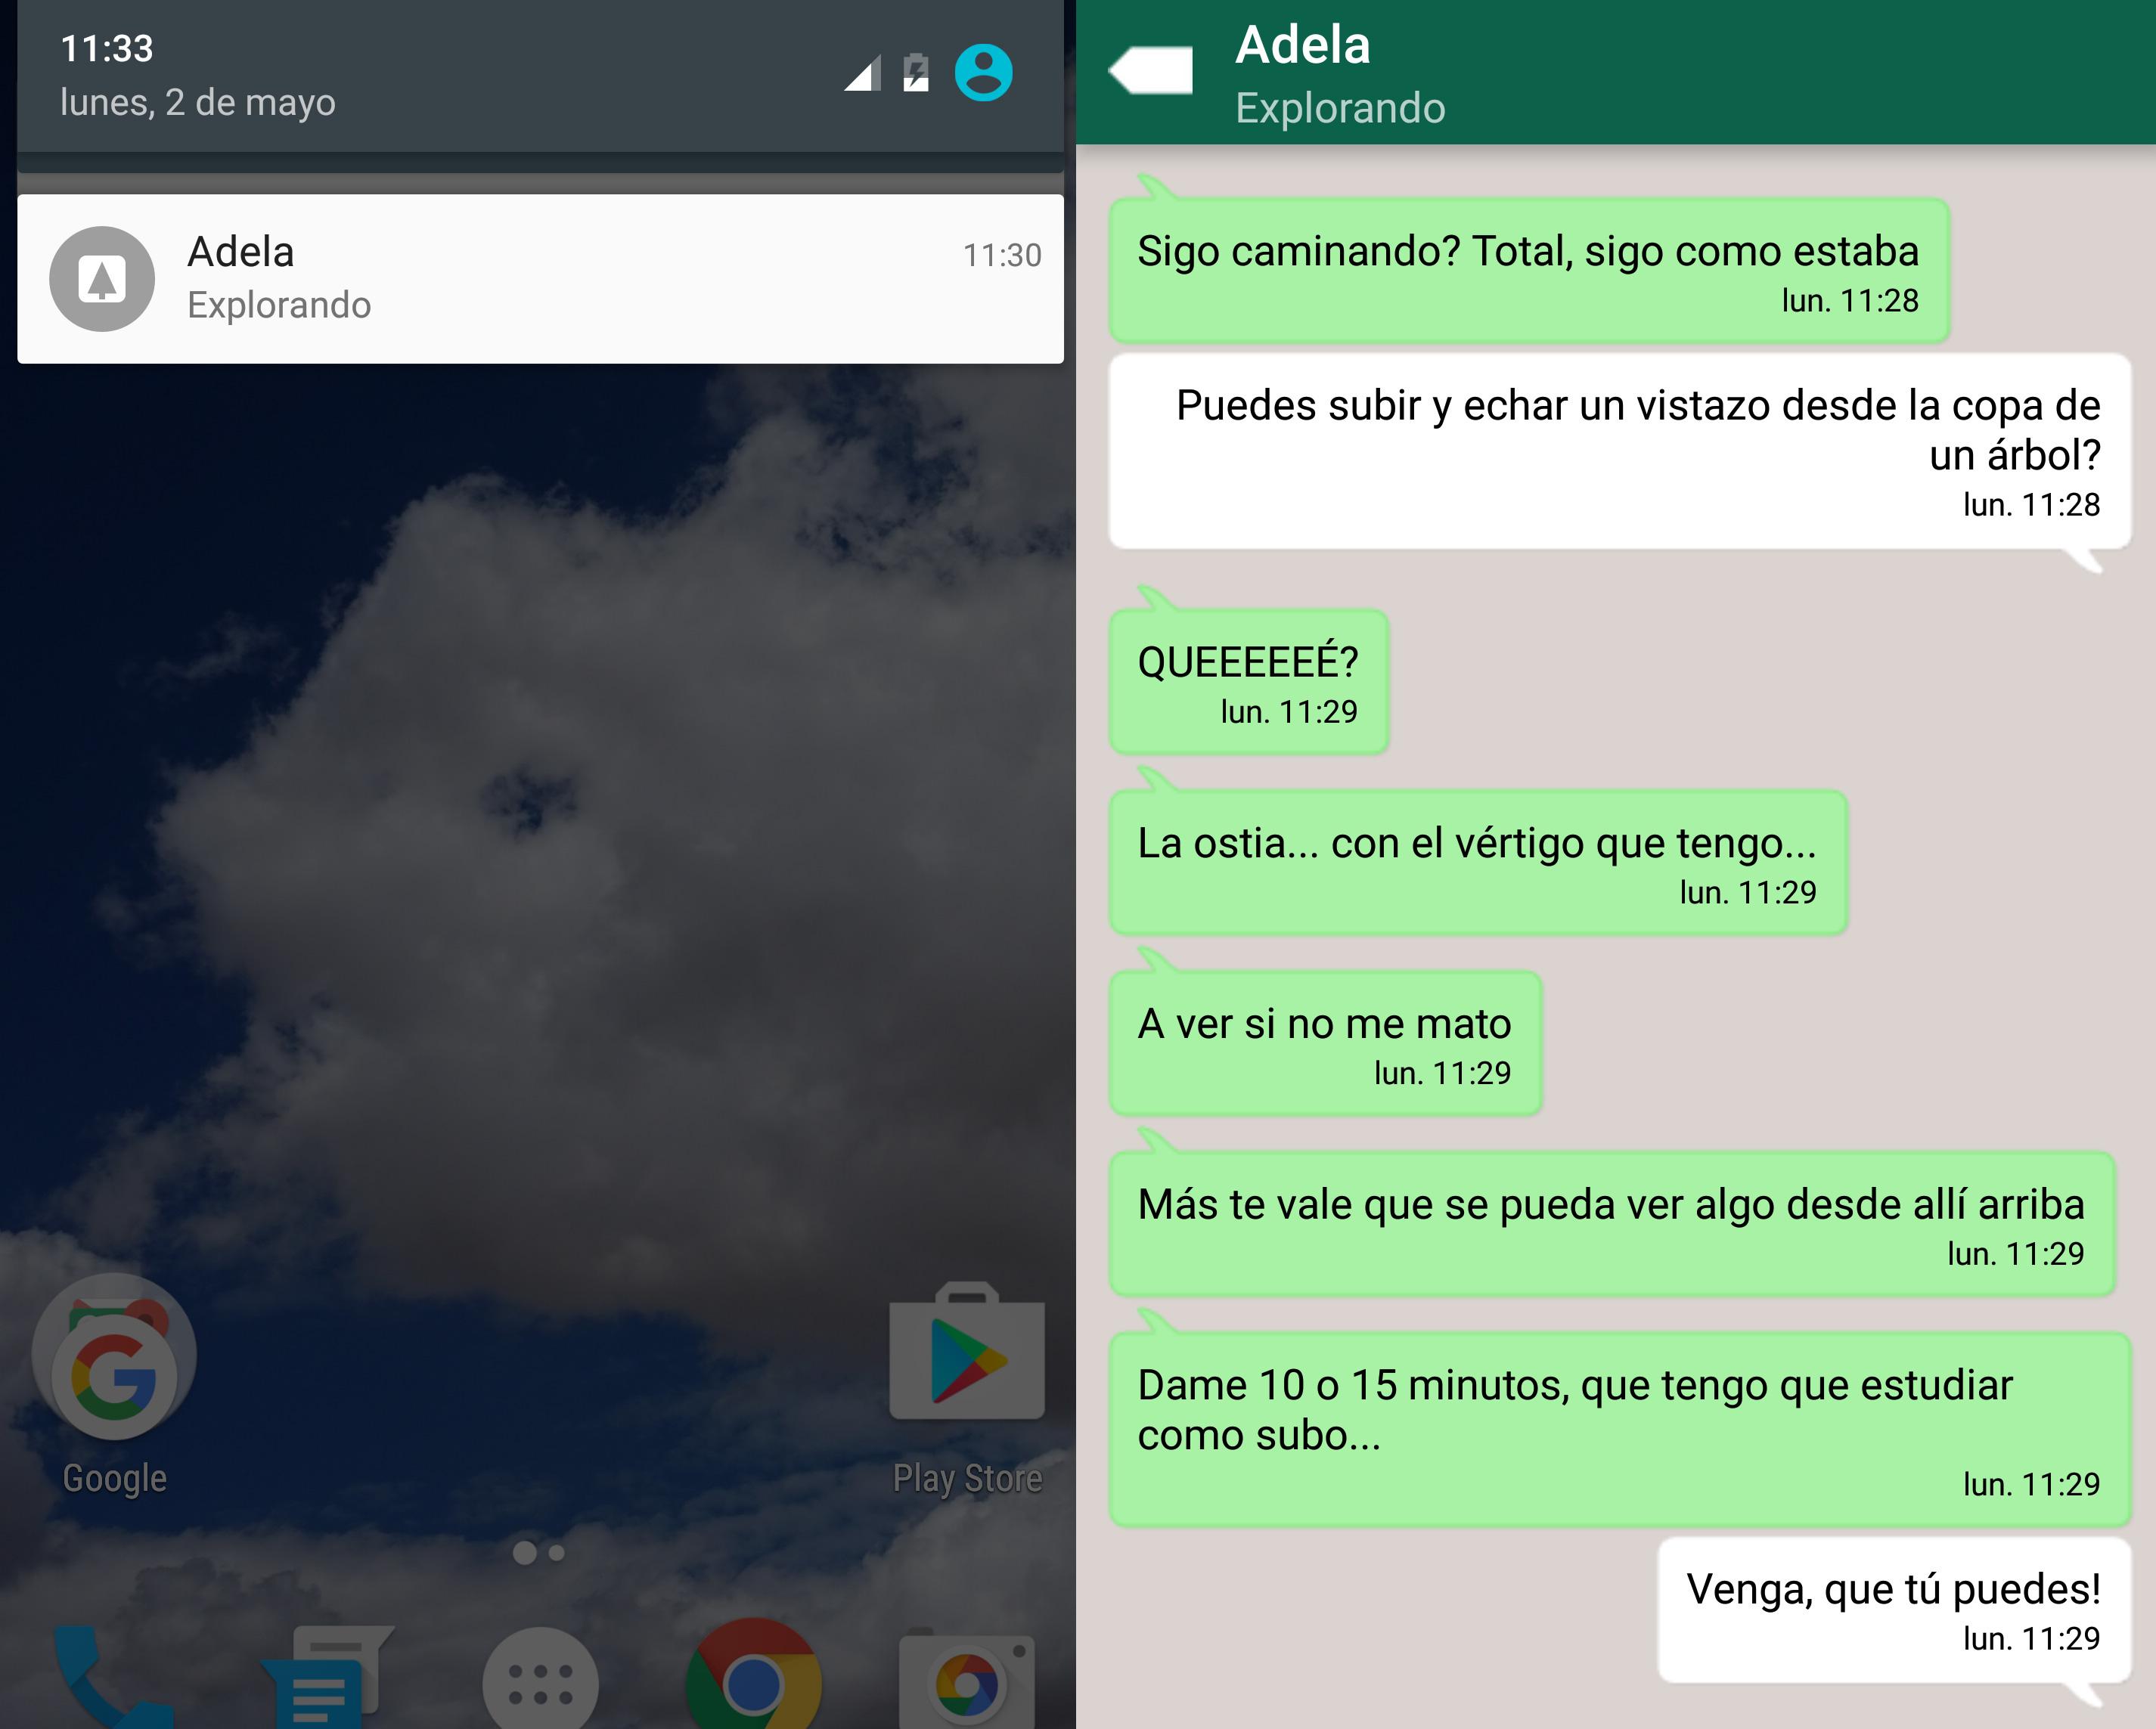 Adela-Juego-Aventura-Android